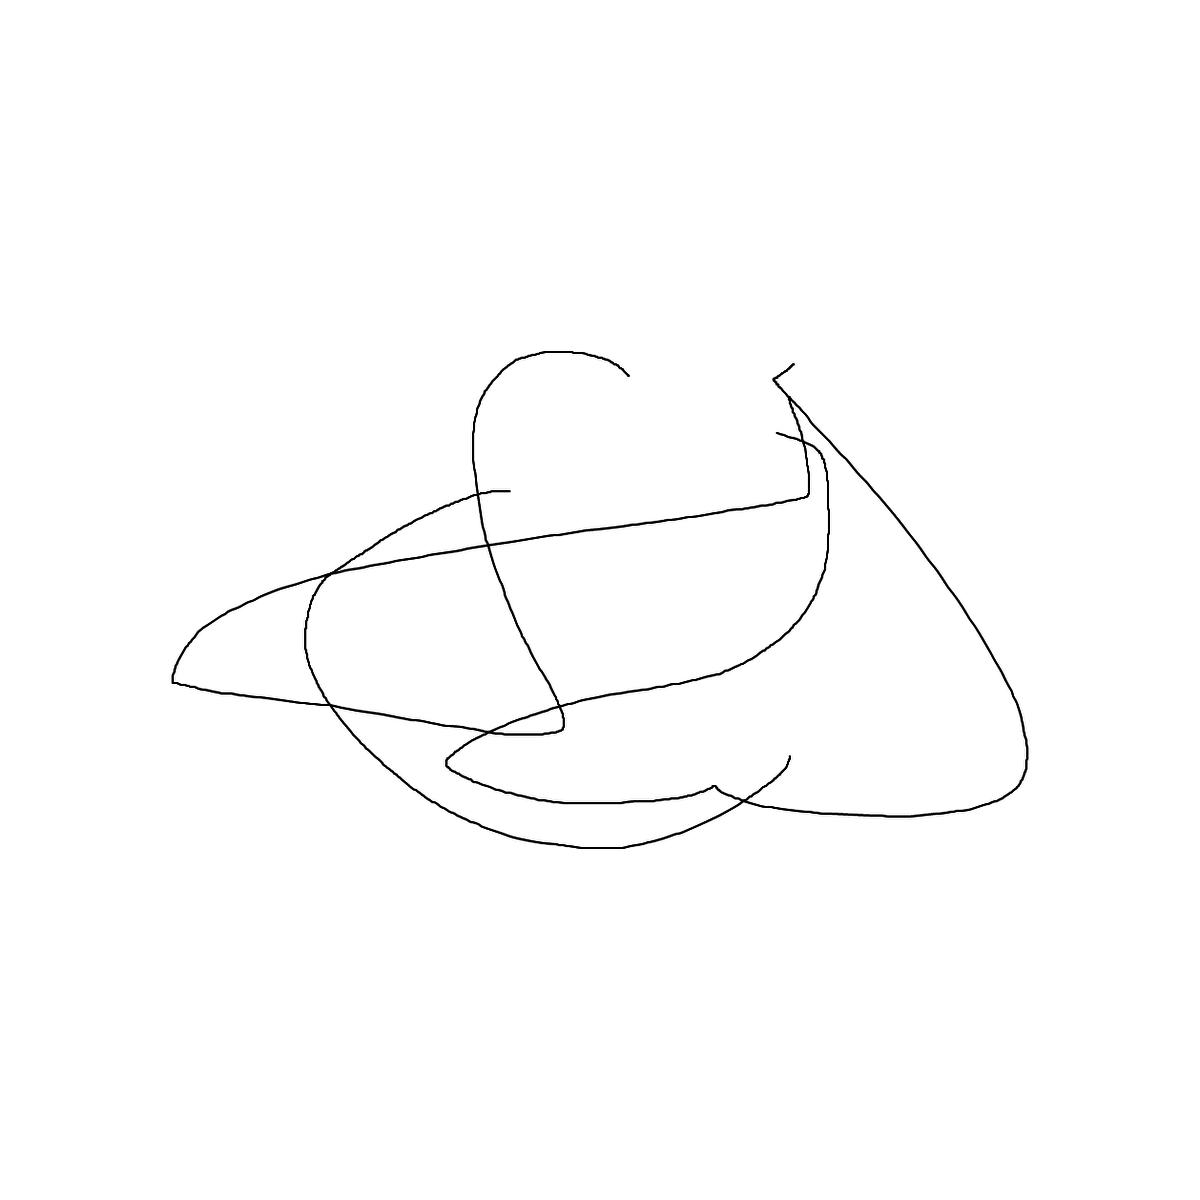 BAAAM drawing#1058 lat:49.0954551696777340lng: 1.7138692140579224